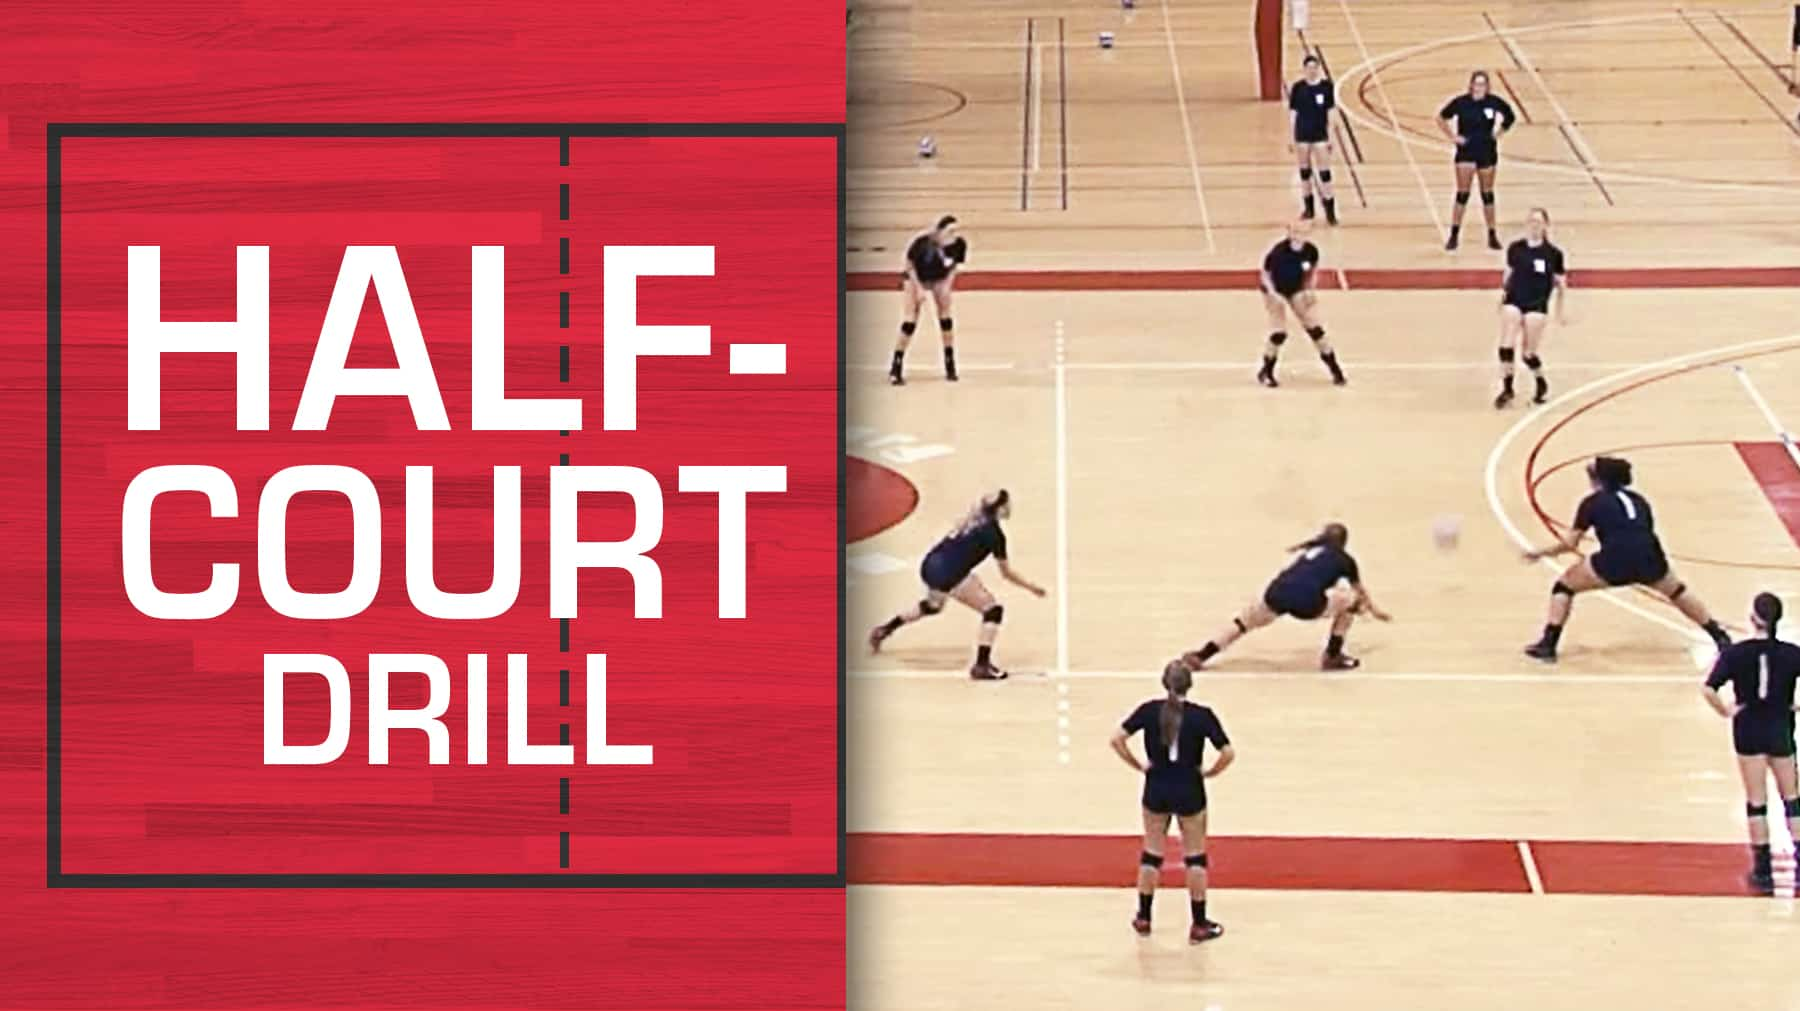 Half Court Drill For Creative Ball Control Training